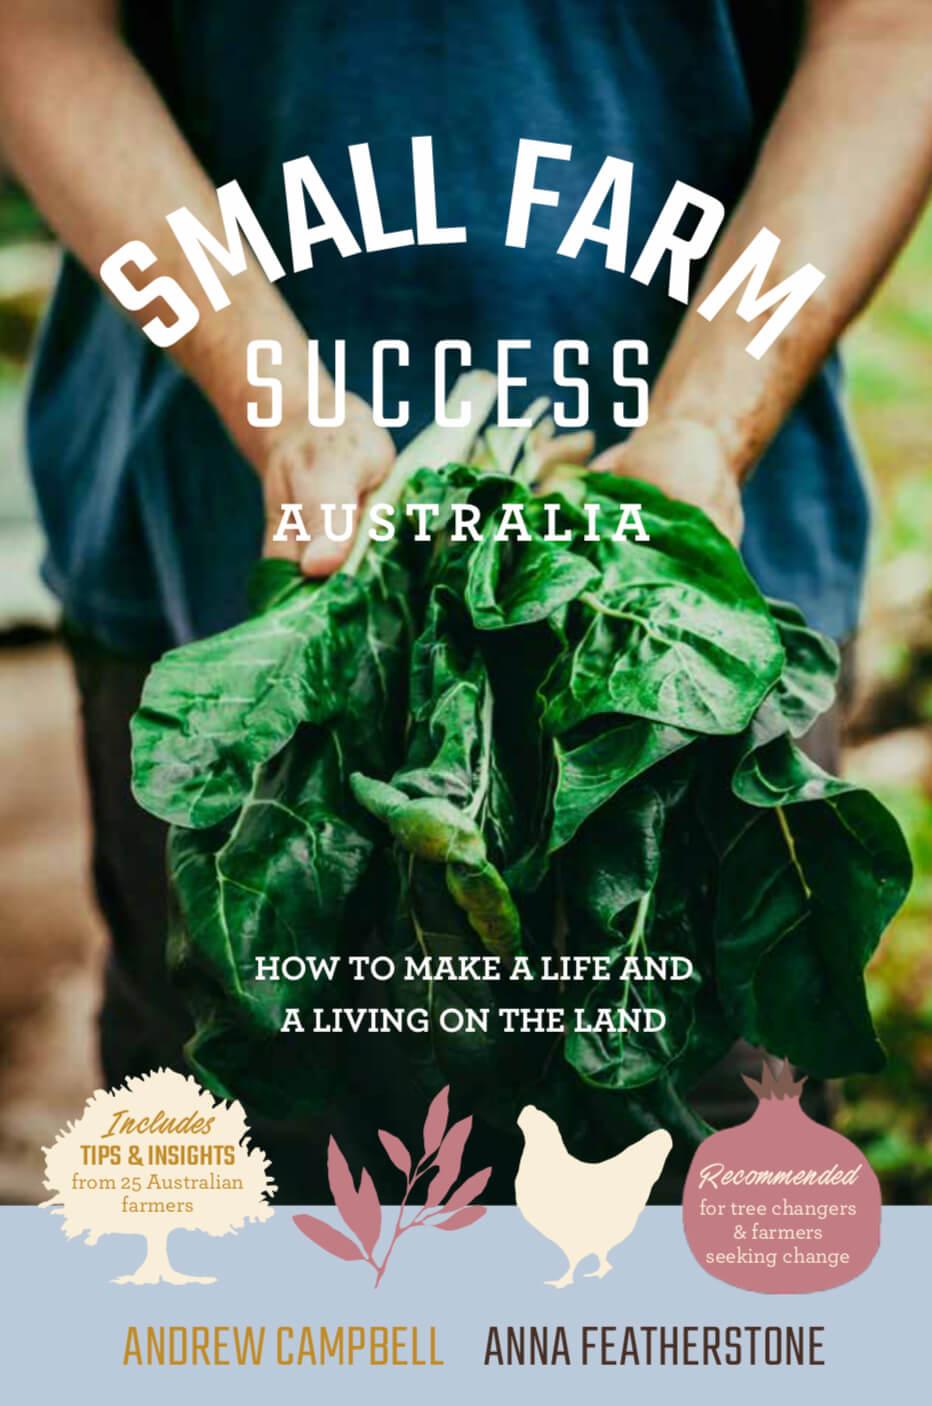 Small Farm Success Australia